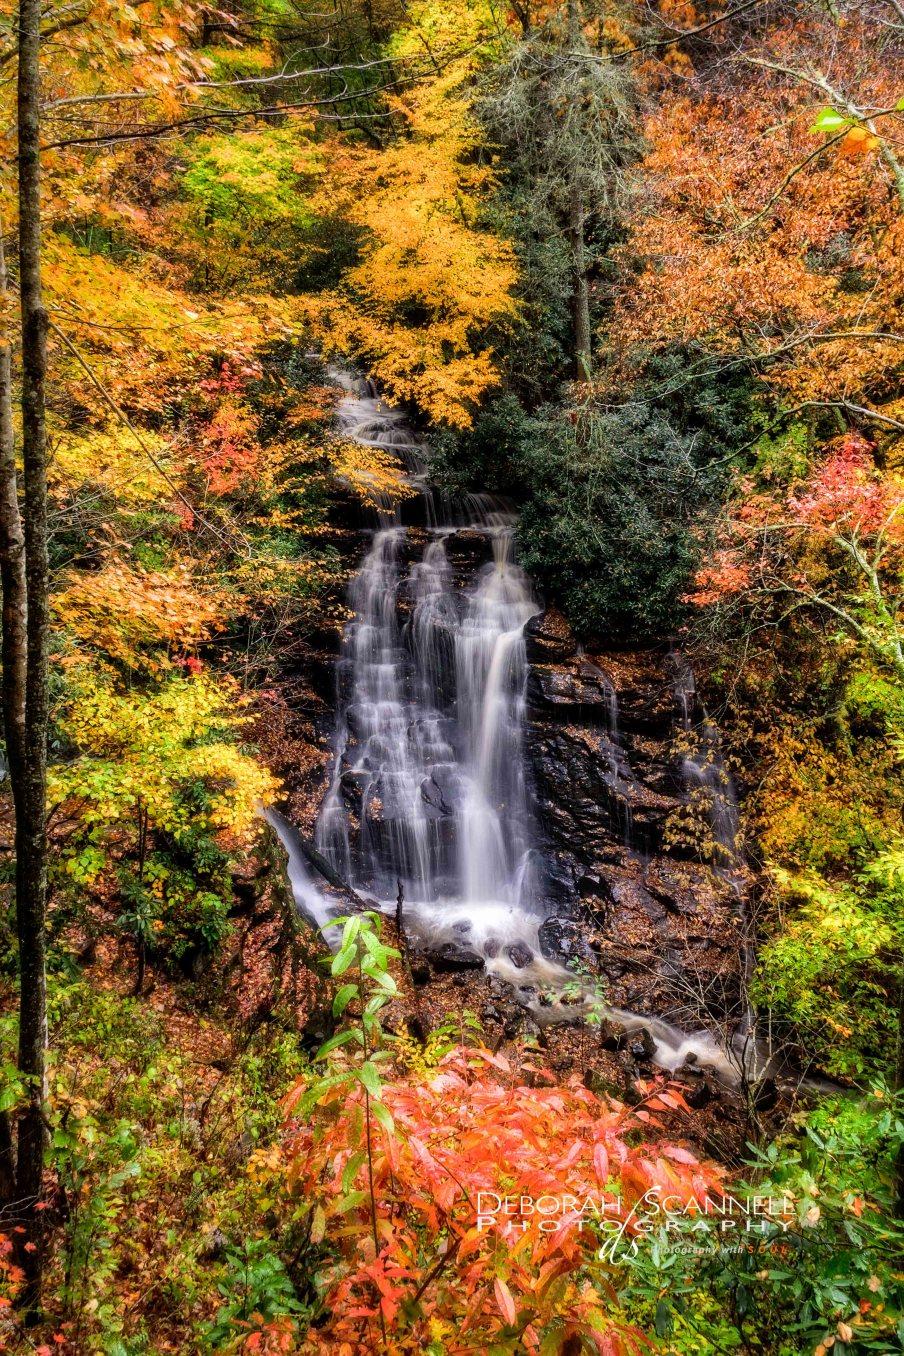 Soco Falls Autumn Day